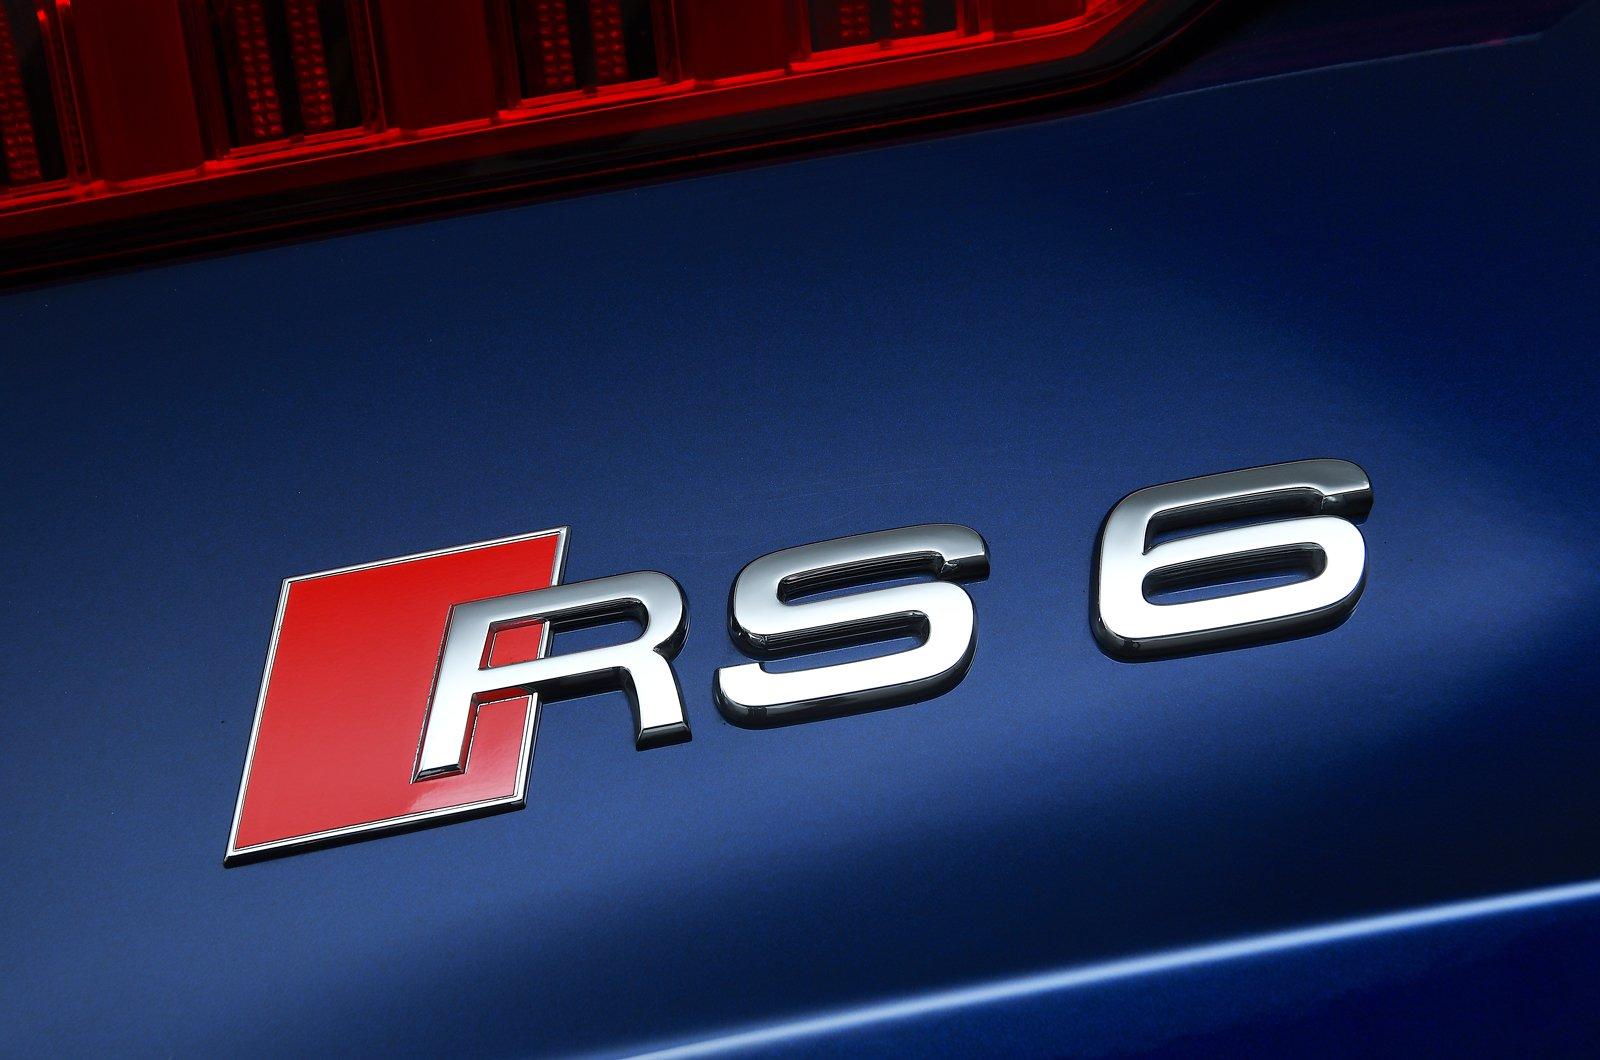 Audi RS6 Avant boot badge